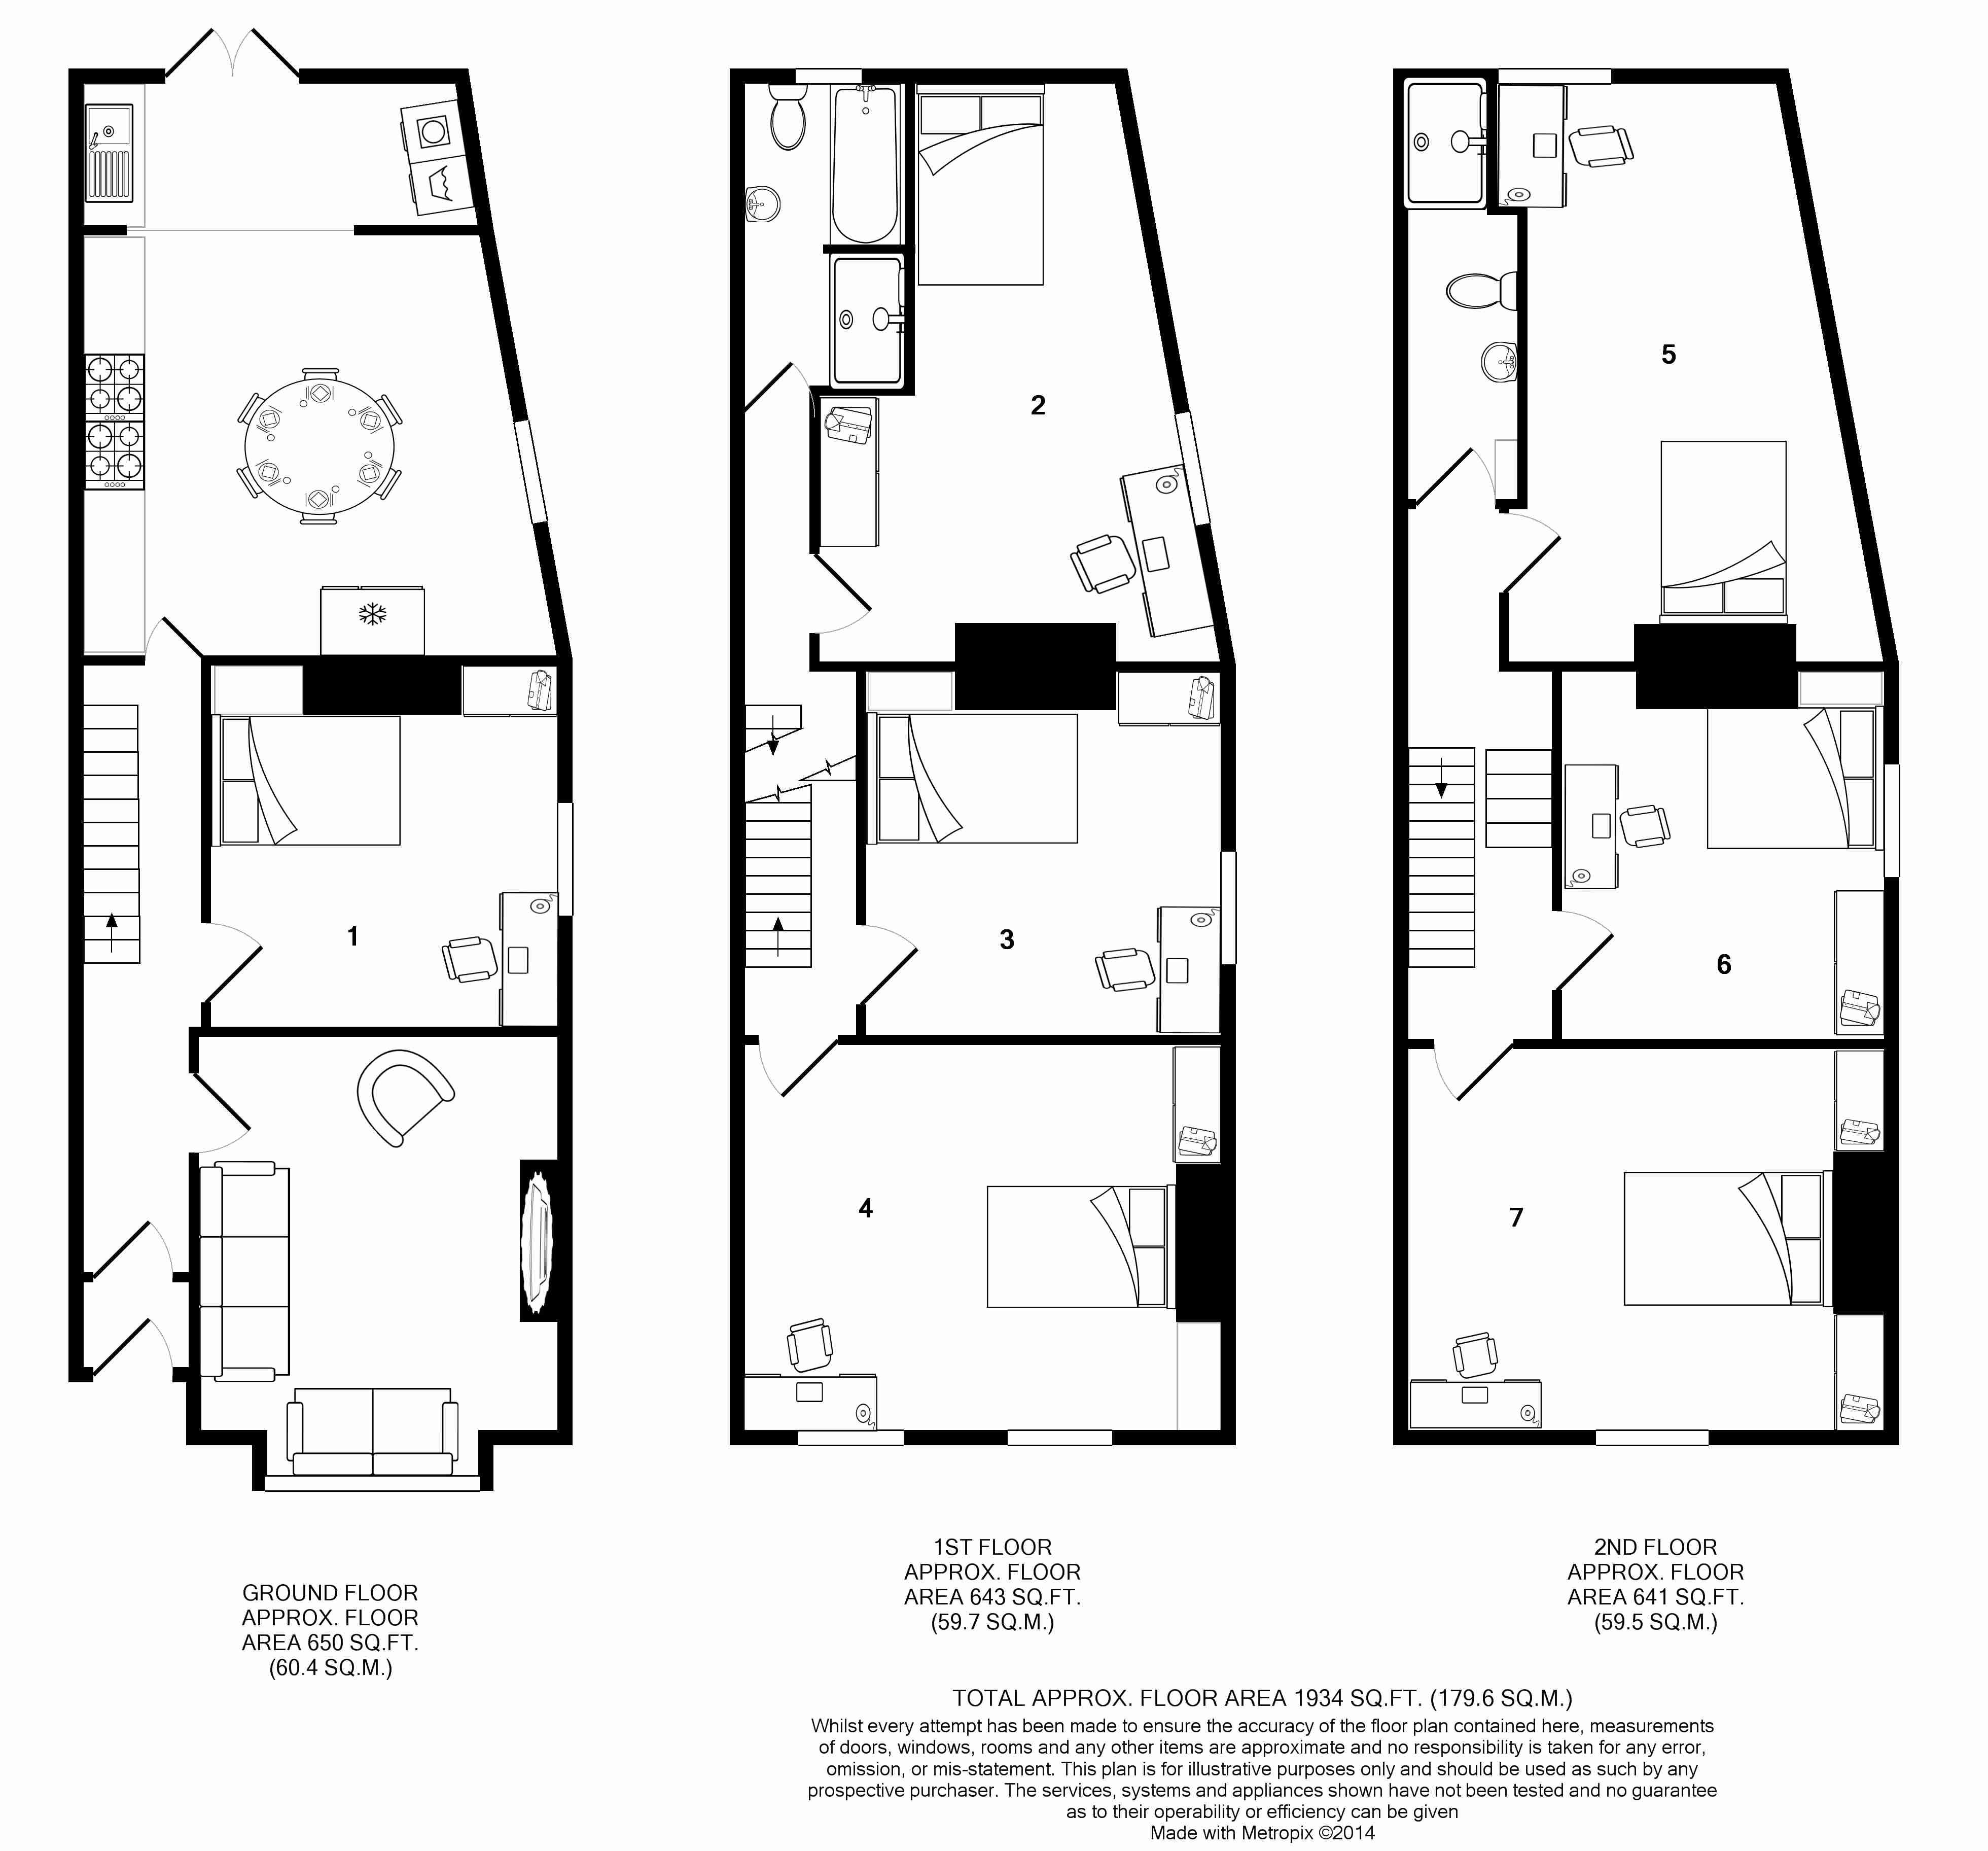 271 Smithdown Road Floorplans